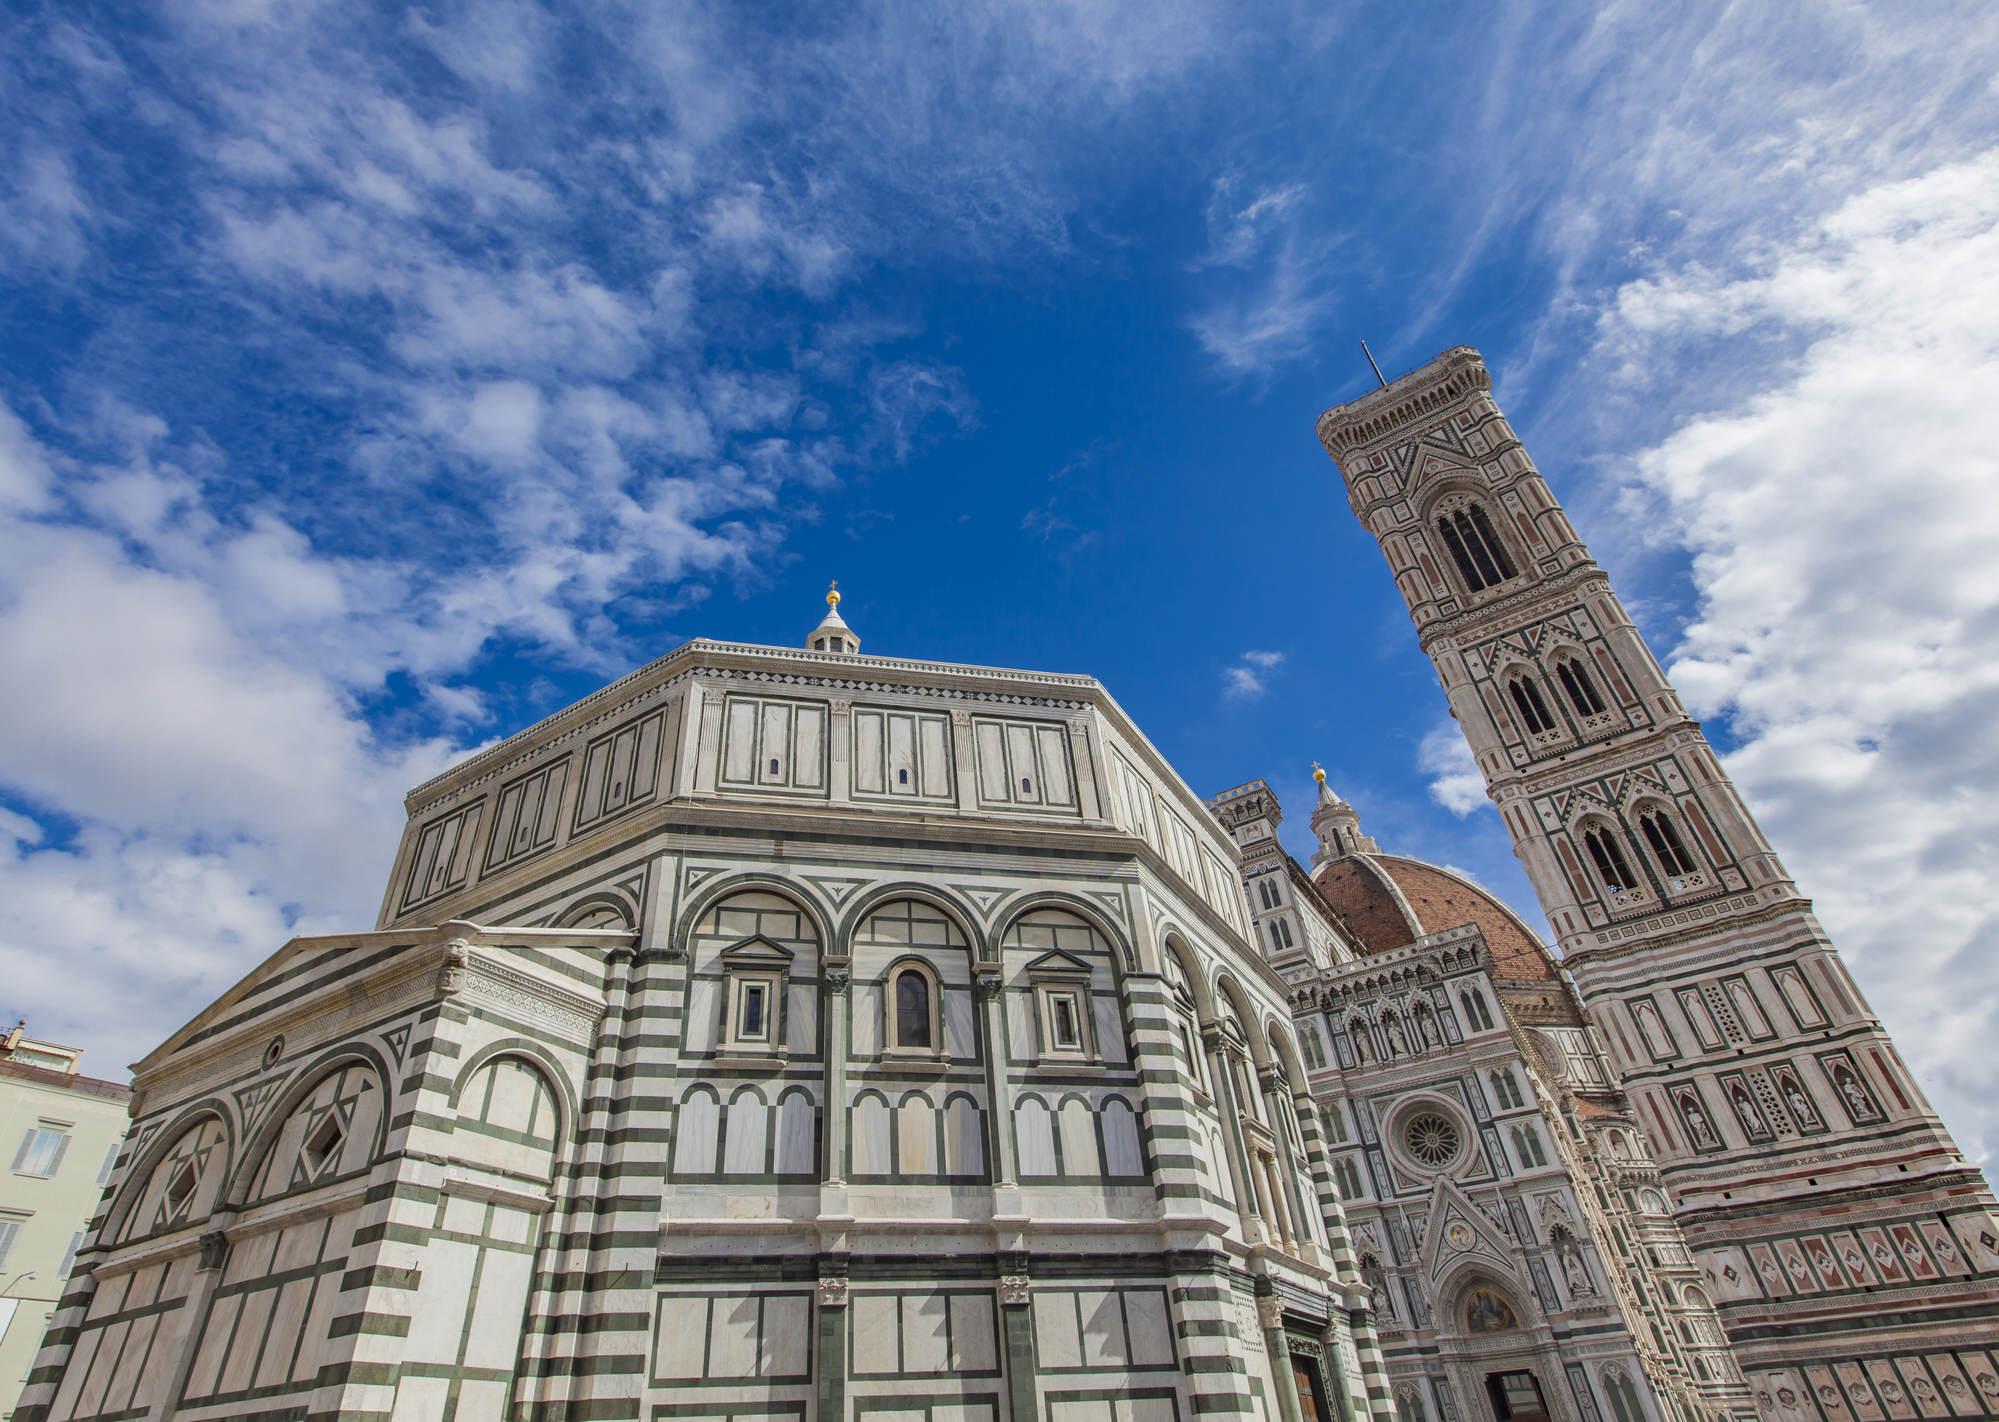 Duomo dicas Viaje Global